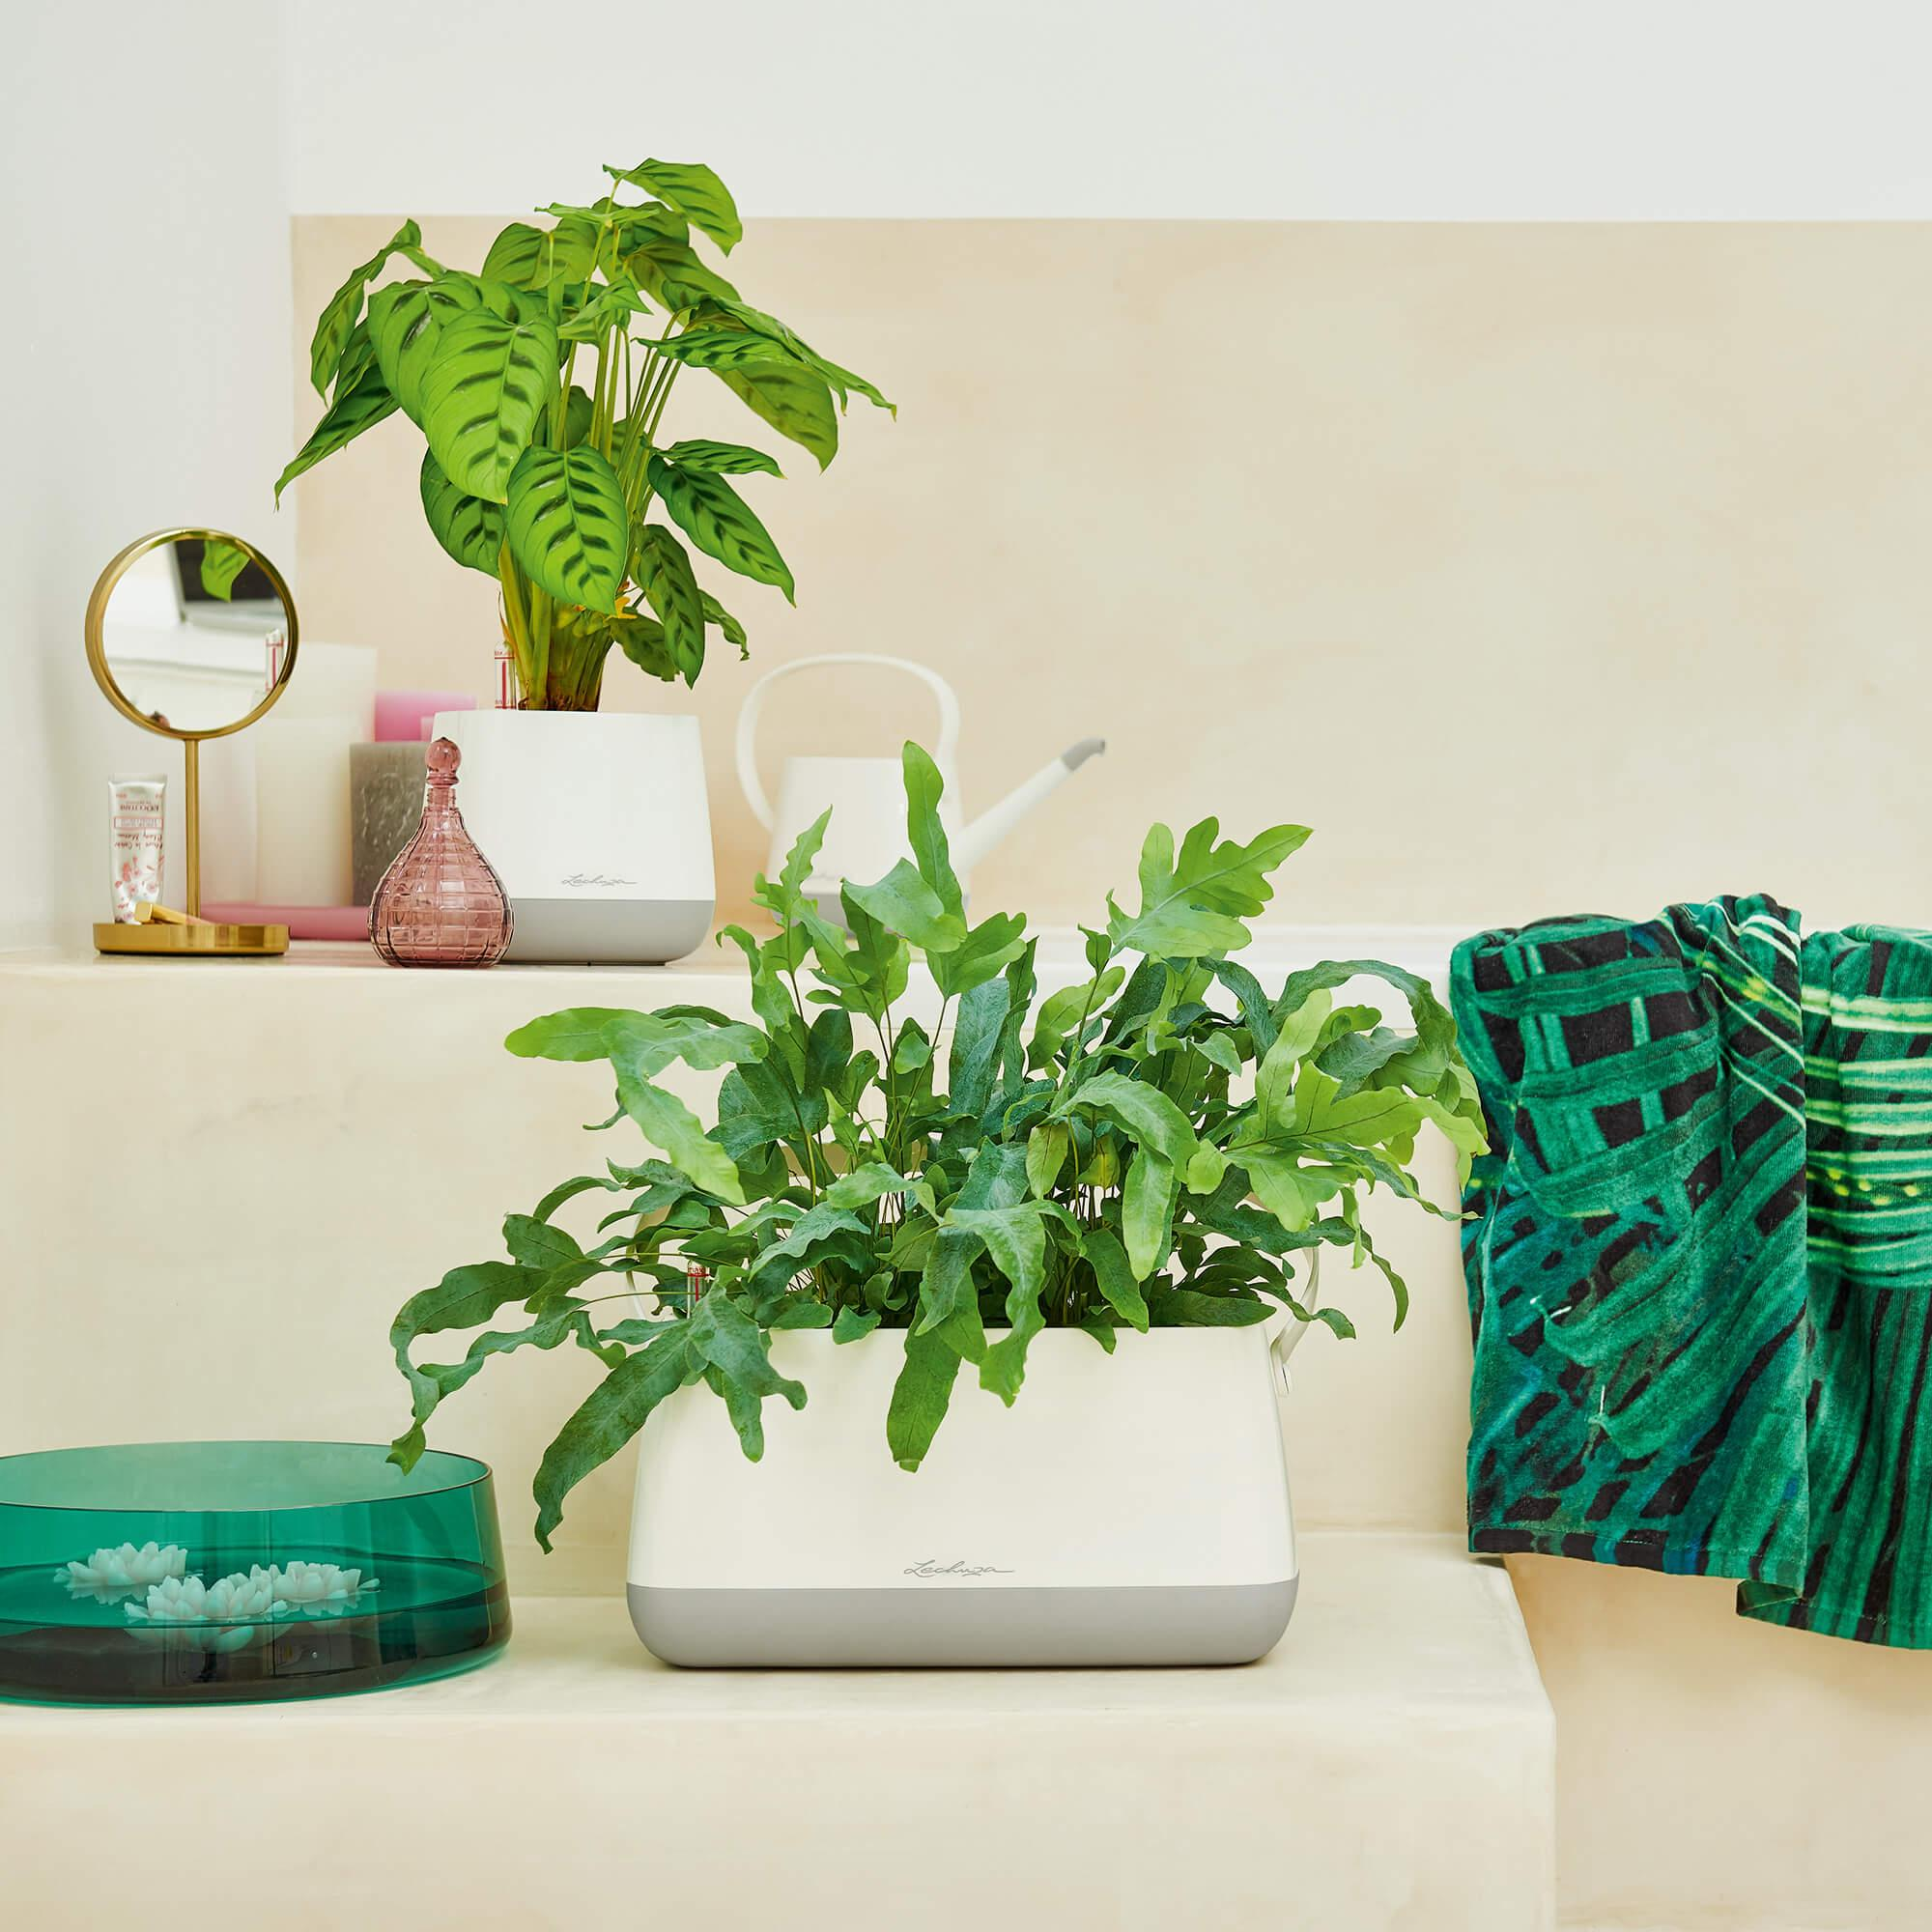 YULA plant bag white/gray semi-gloss - Image 10